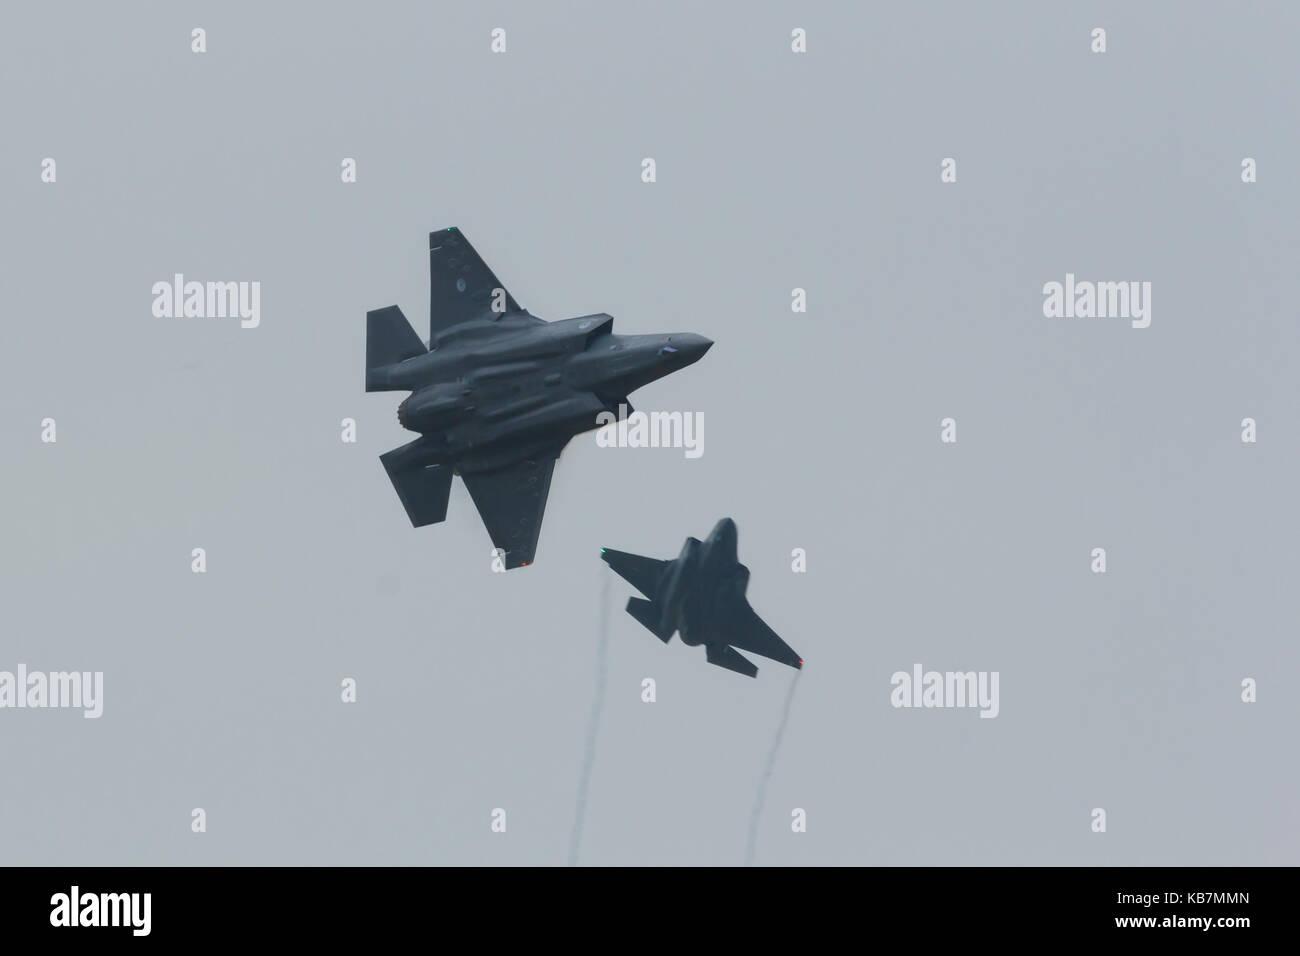 Lockheed Martin-F-35 Lightning II - Stock Image